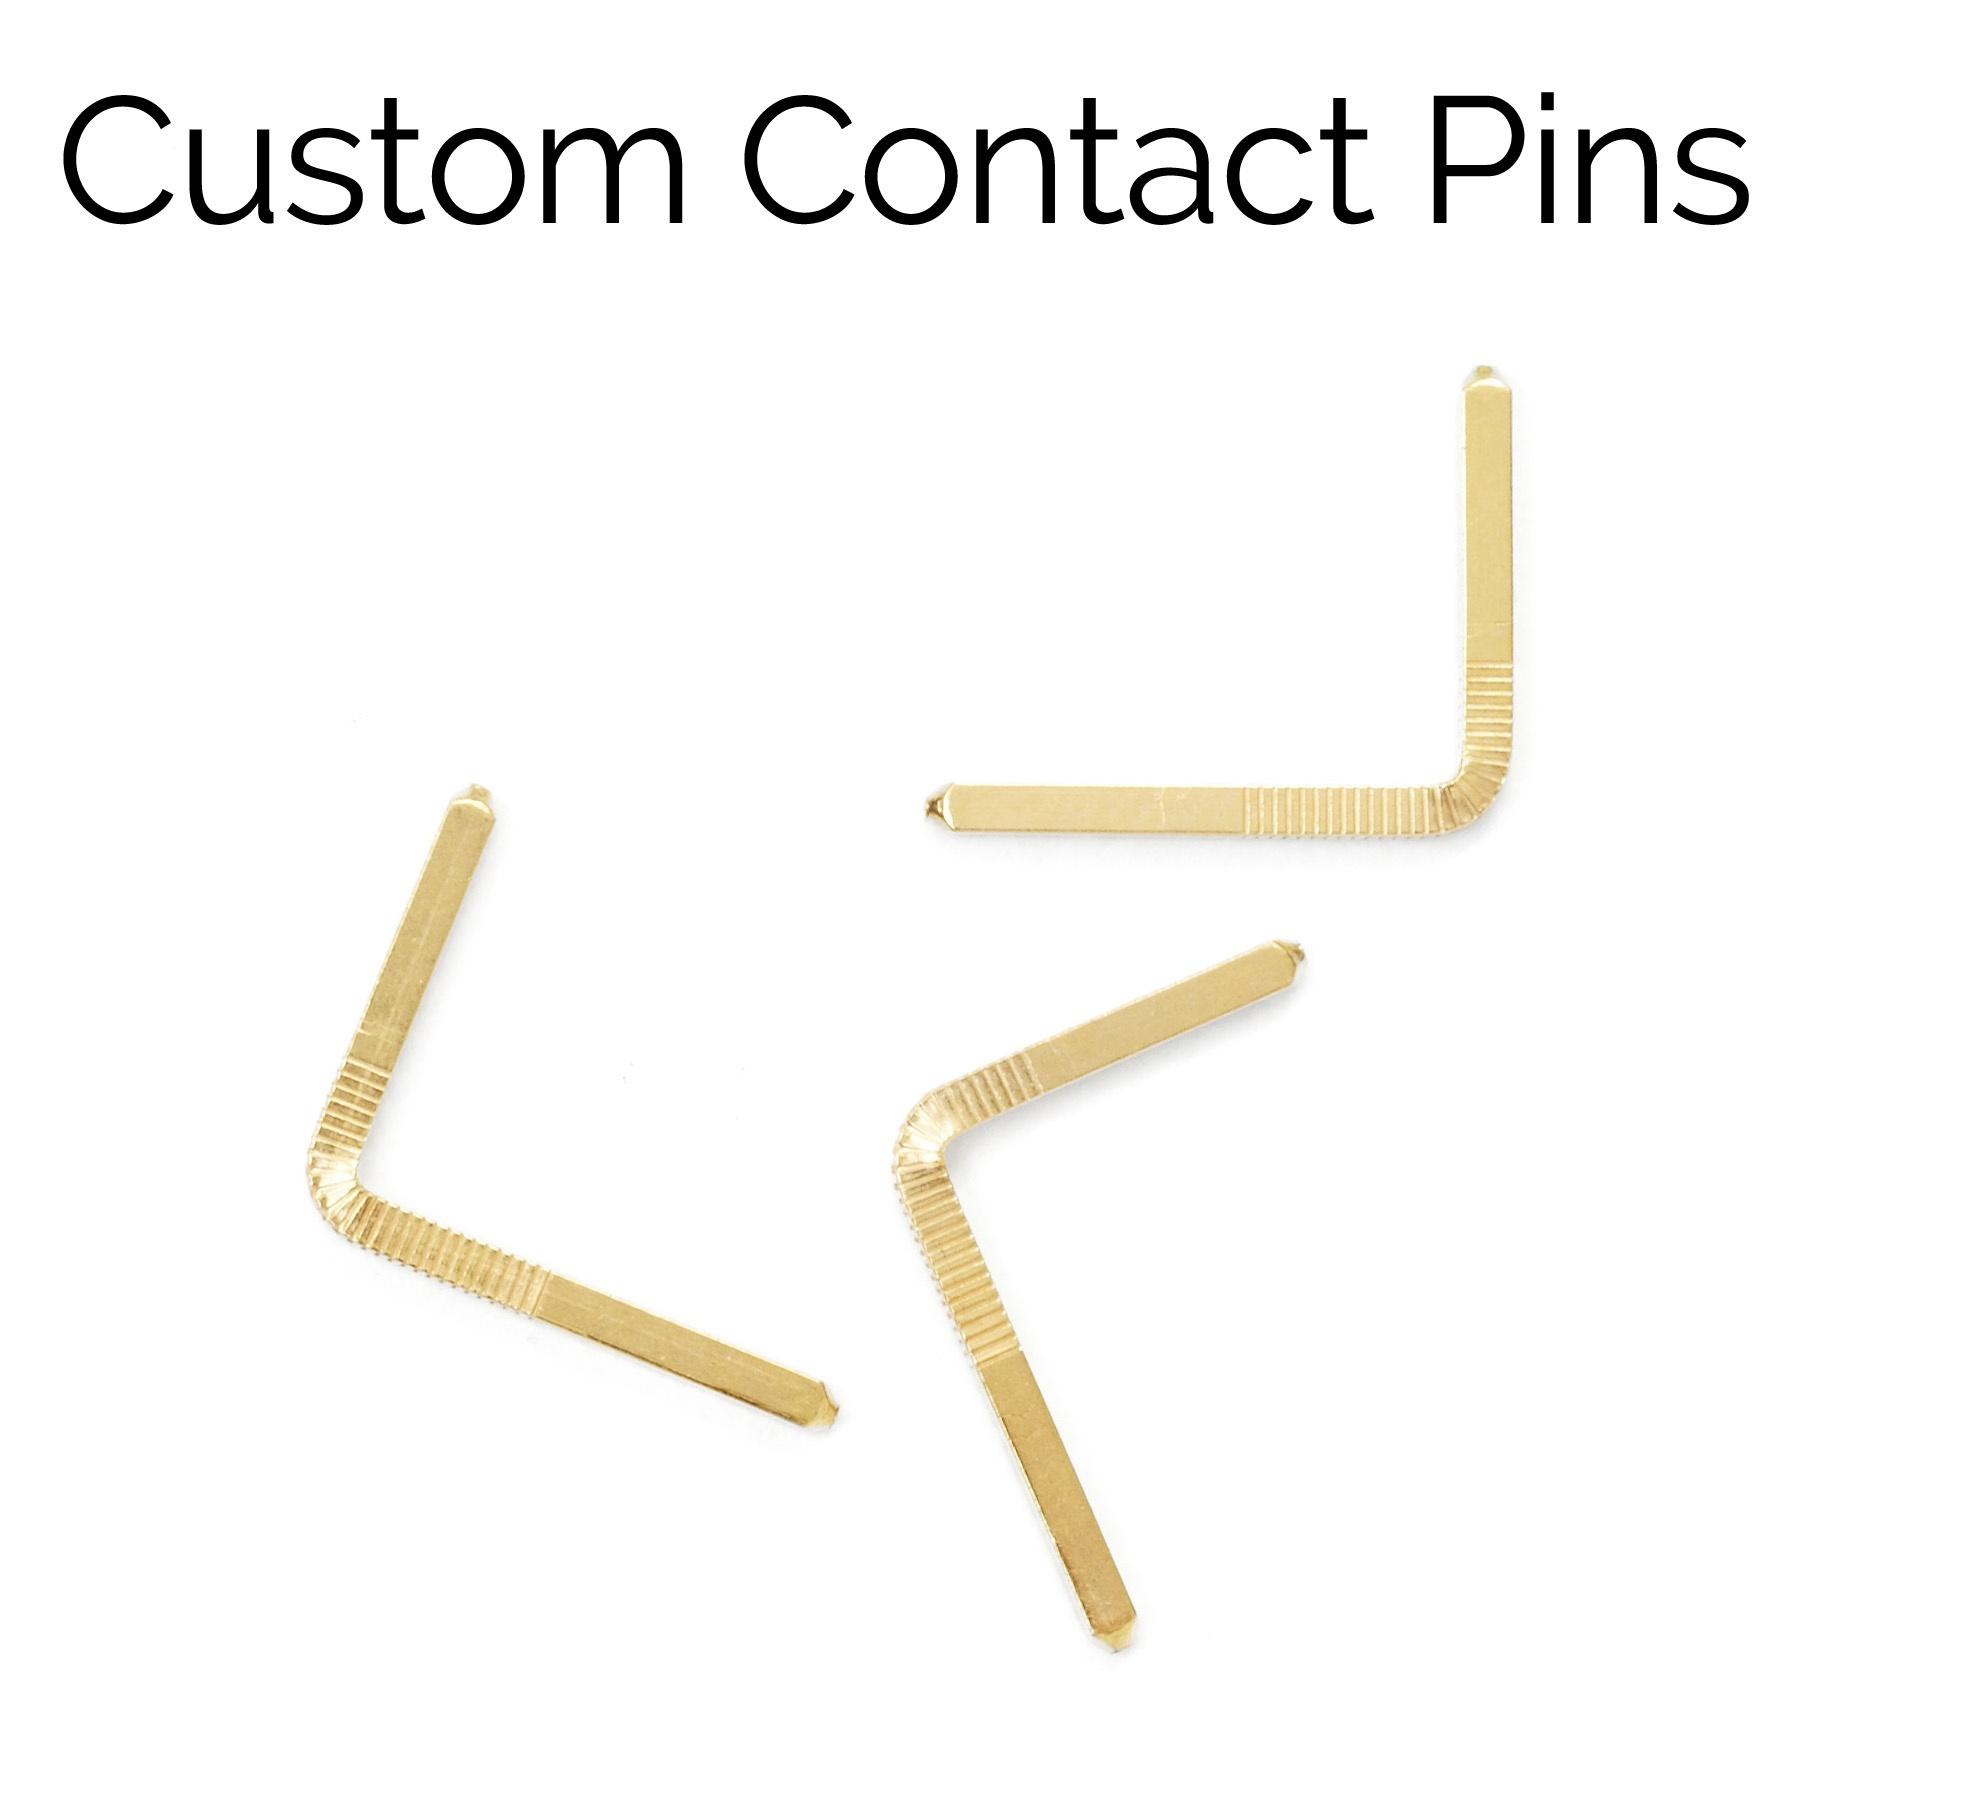 Custom Contact Pins